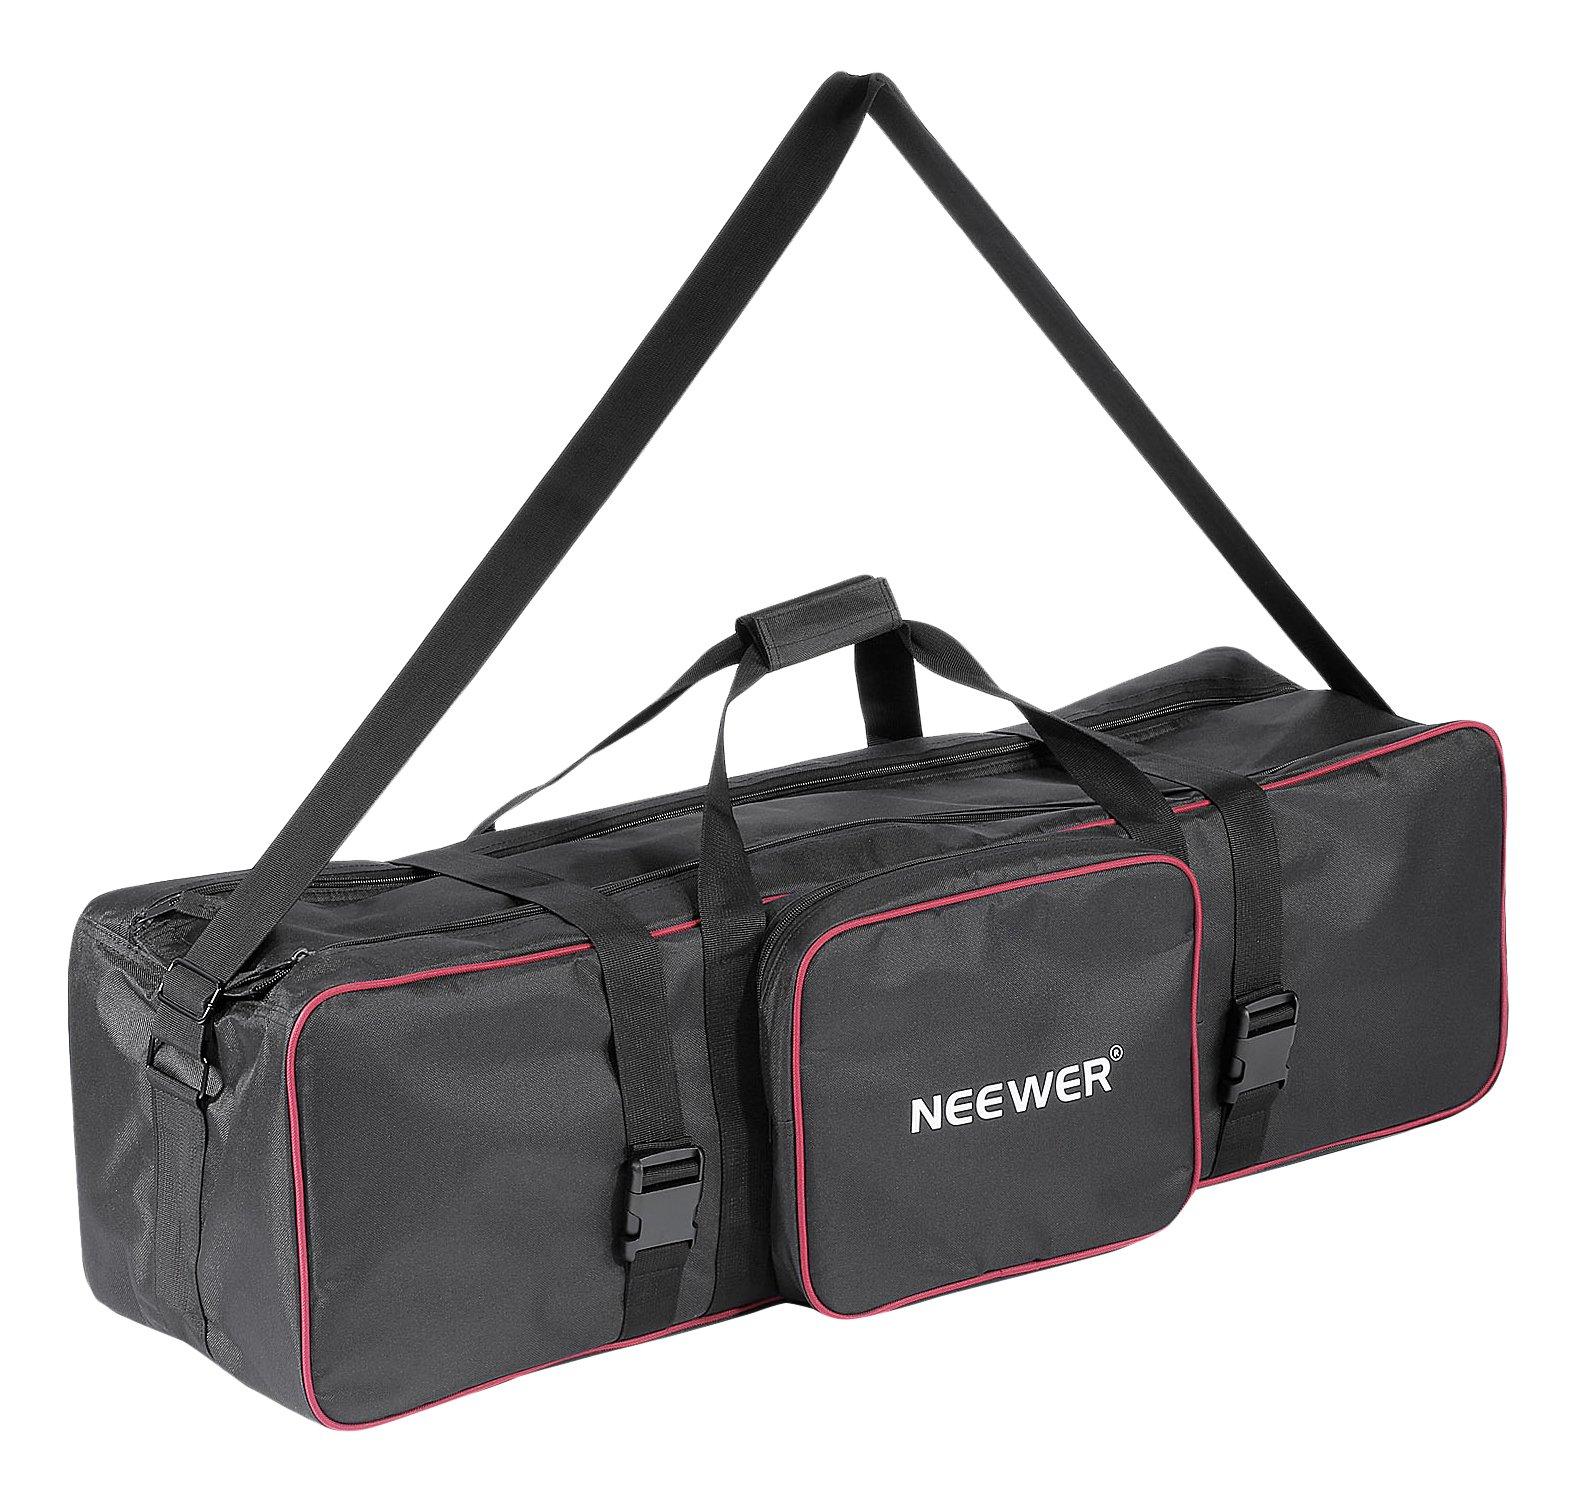 89a35364acc5 Neewer 30inchx10inchx10inch/77cmx25cmx25cm Photo Video Studio Kit Large  Carrying Bag for Light Stand Umbrella product